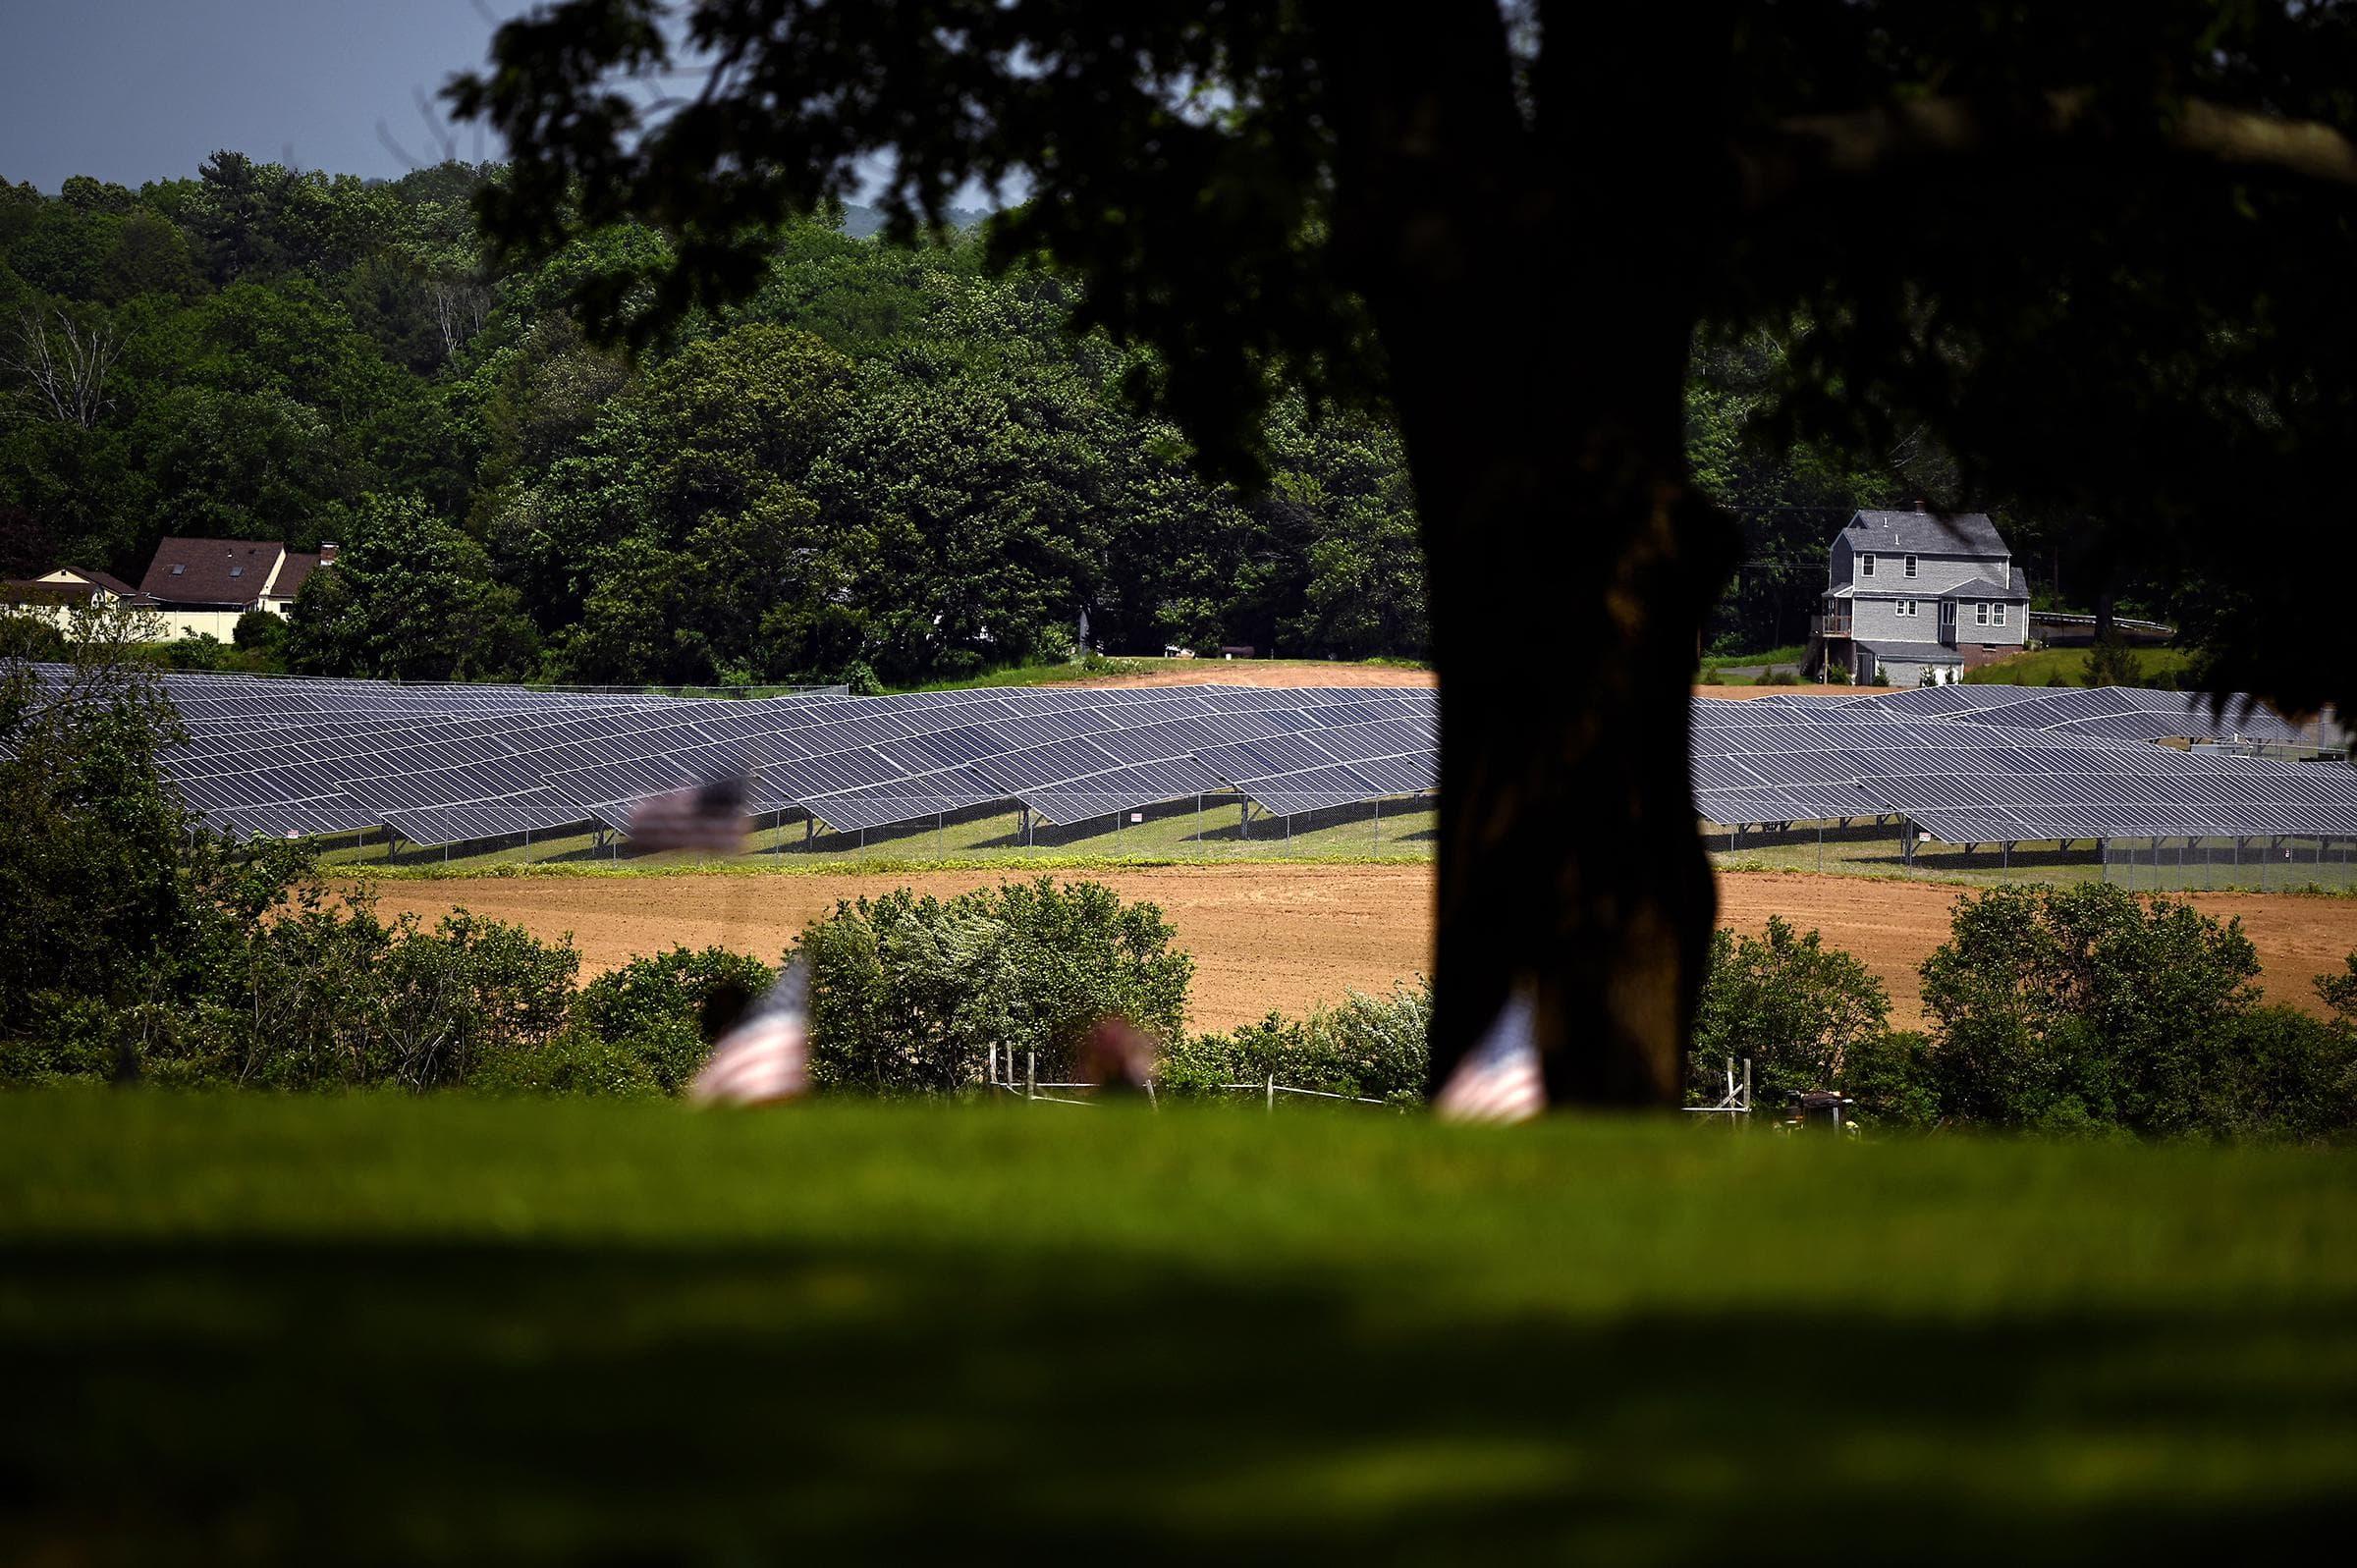 A solar farm near All Saints Cemetery in North Haven, Conn., on May 26, 2021. (Joe Amon/Connecticut Public)